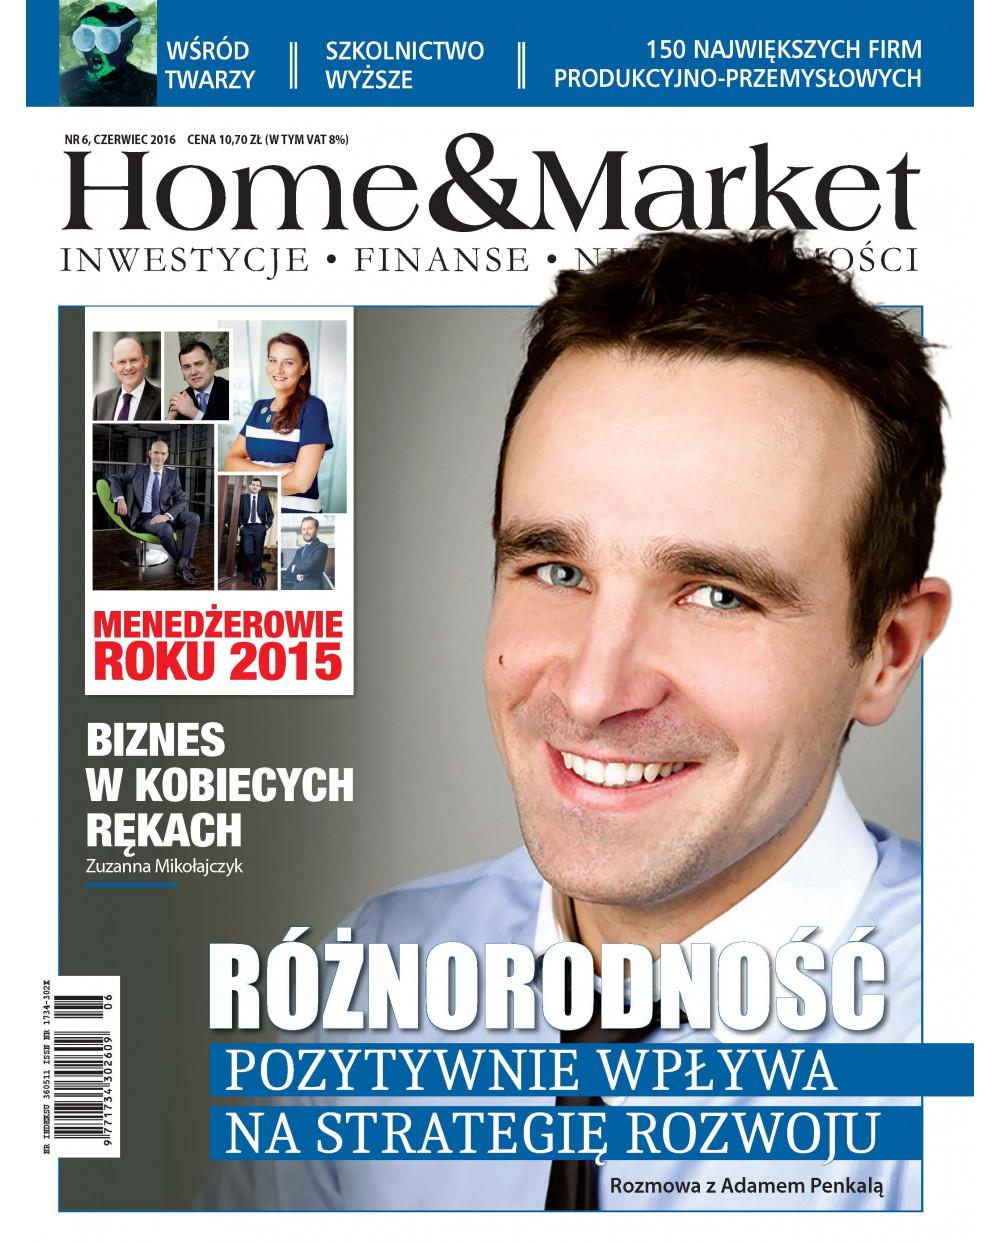 Home&Market 06/2016